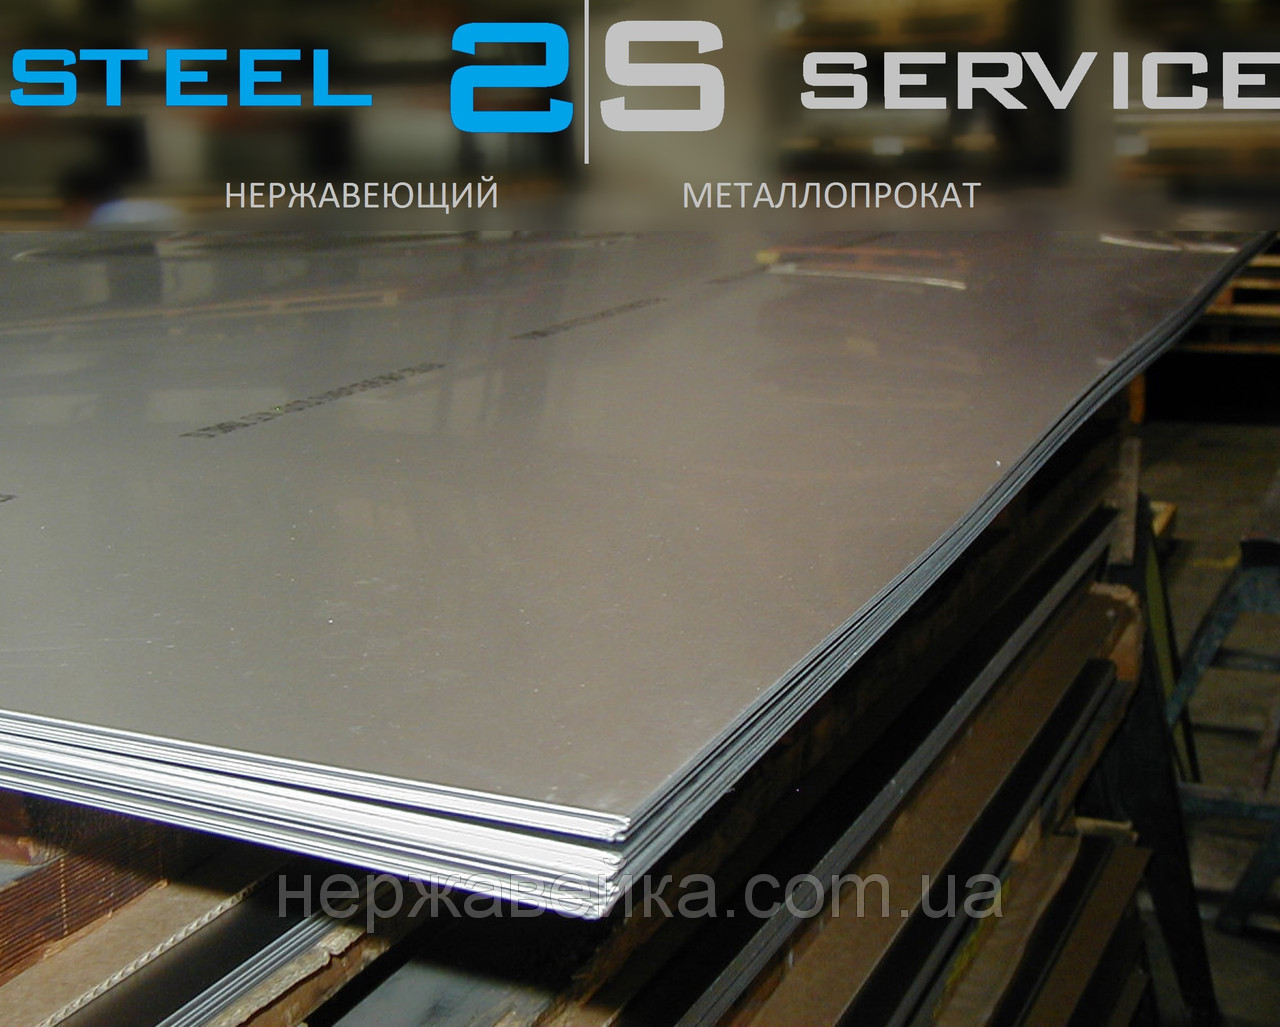 Нержавеющий лист 1х1500х3000мм  AISI 316L(03Х17Н14М3) BA - зеркало,  кислотостойкий